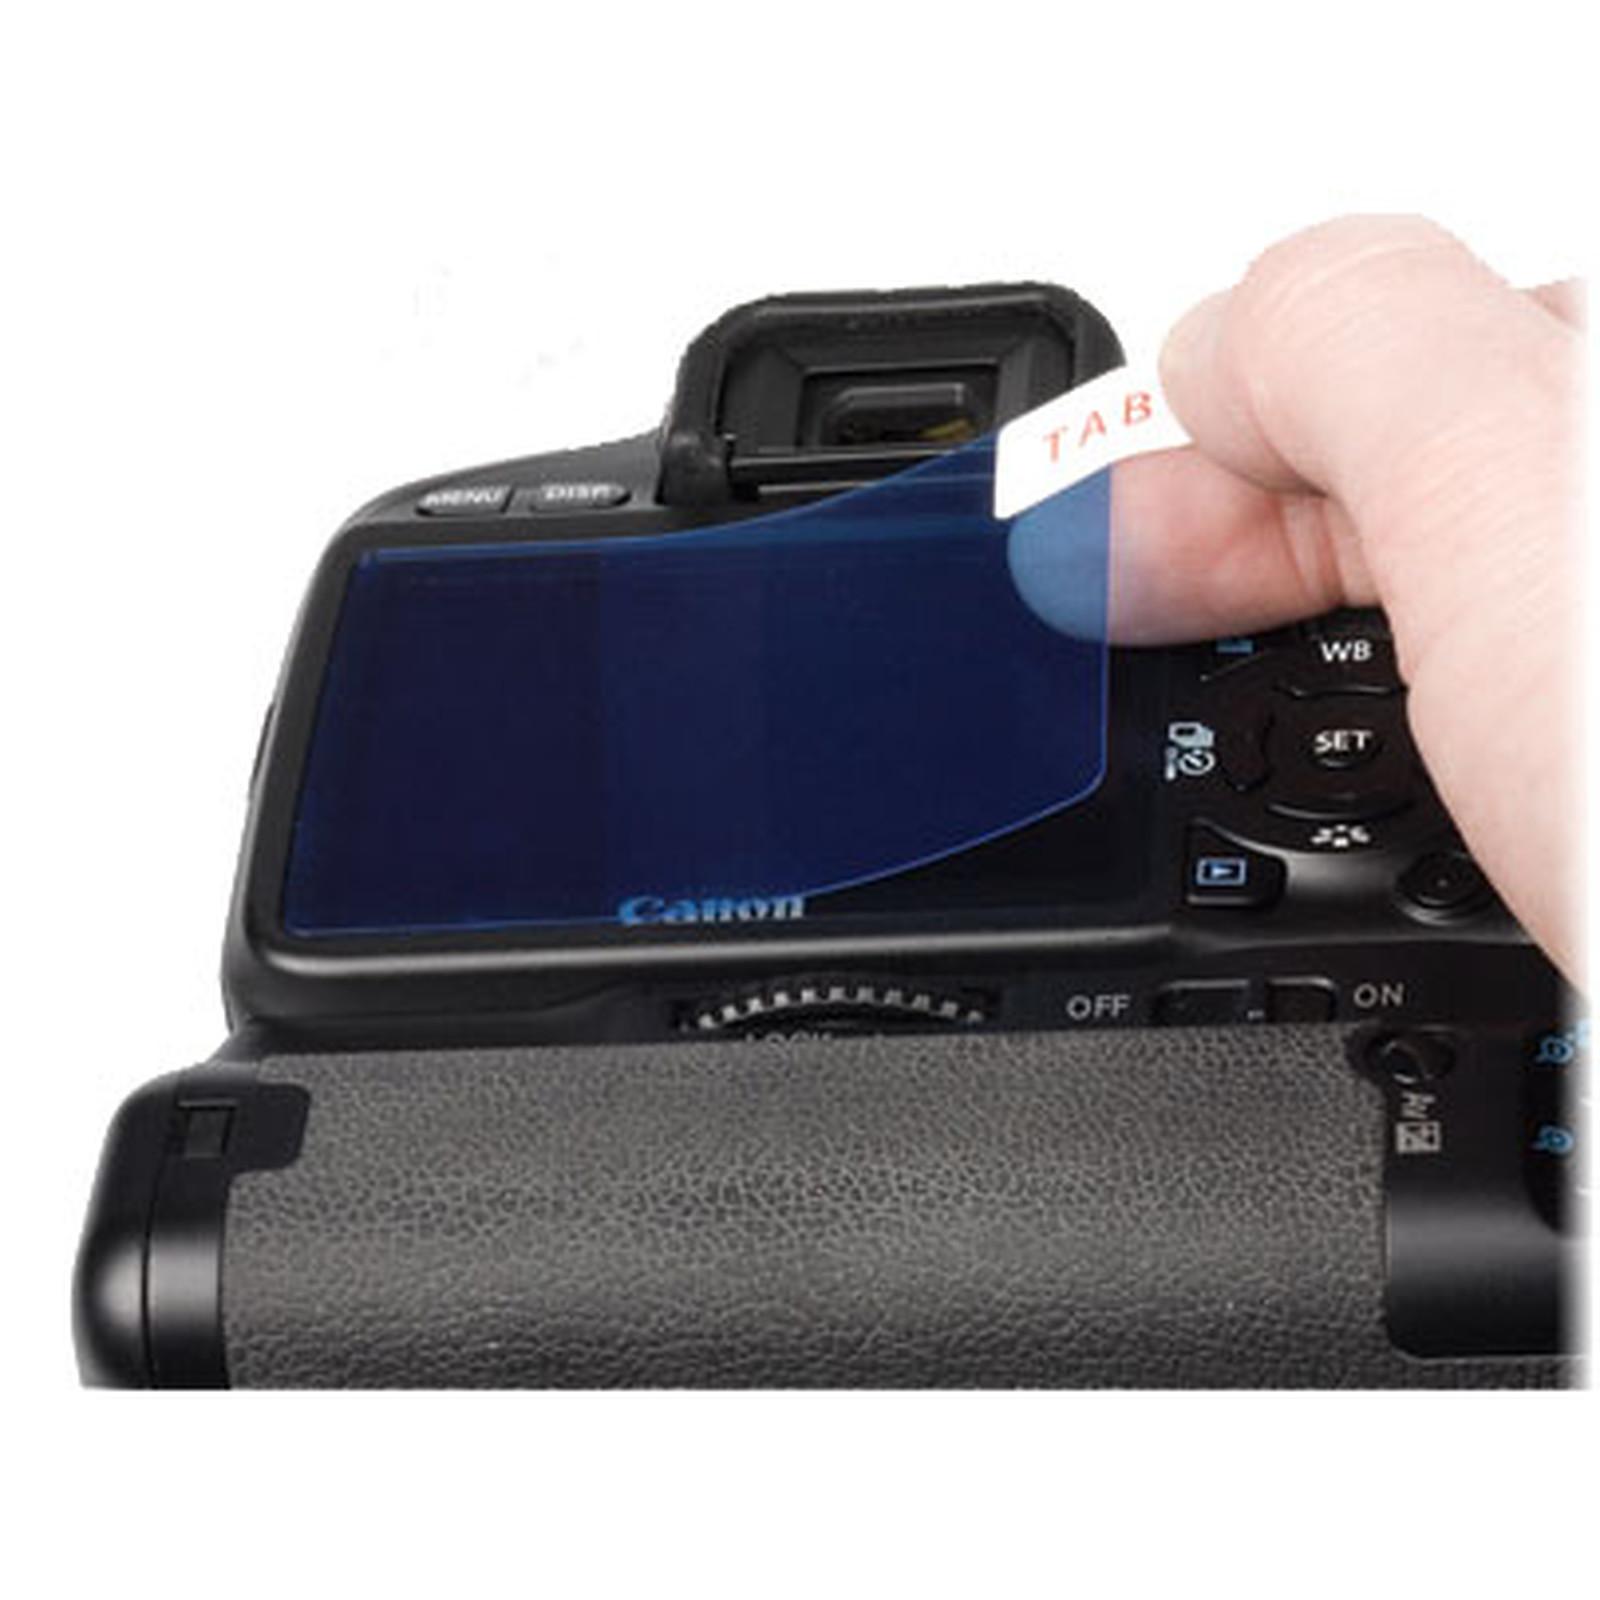 Kenko Film de Protection LCD pour Sony Alpha 7 II / Alpha 7R II / Alpha 7S II / Alpha 7R III et Alpha 9